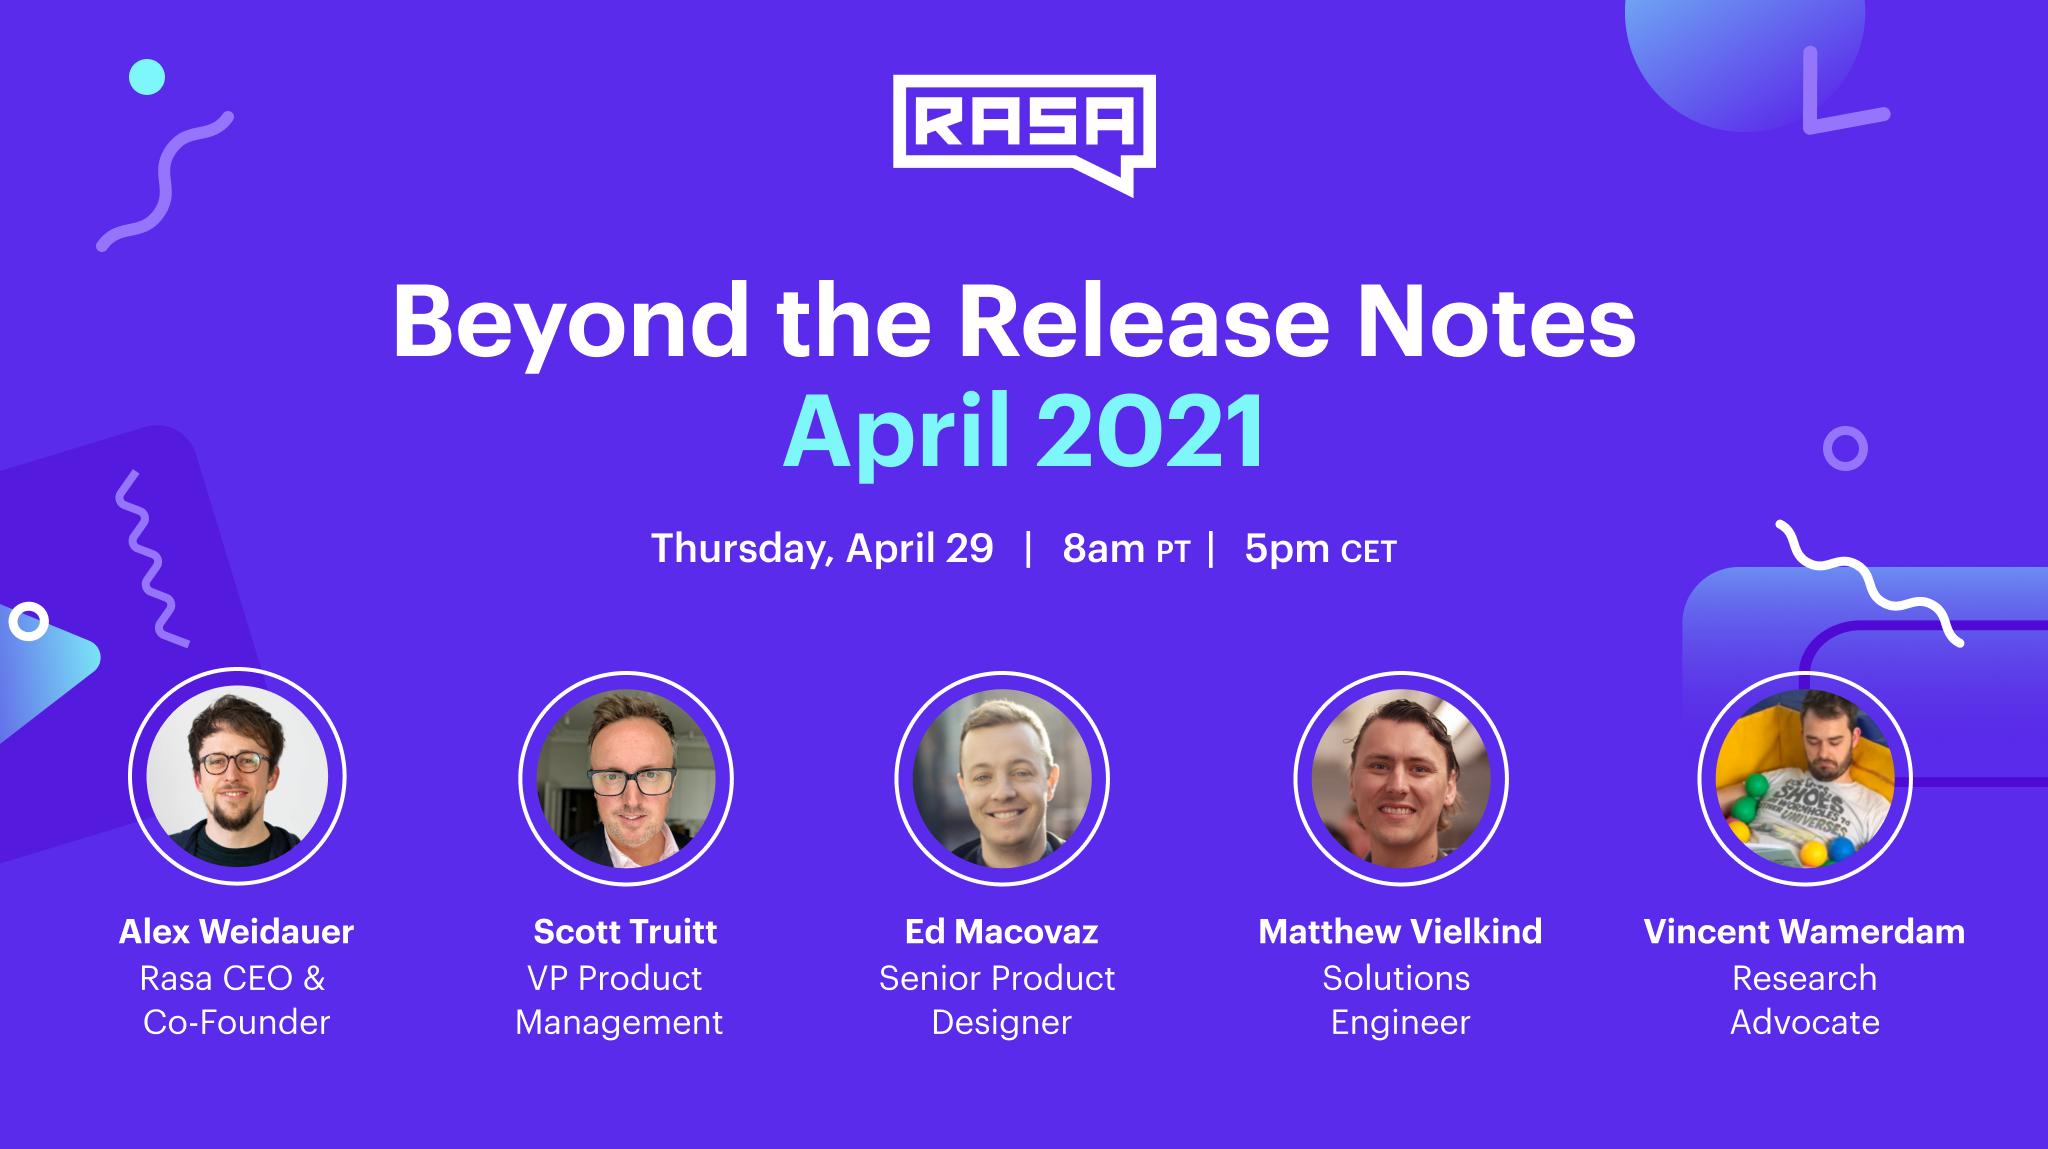 webinar_beyond_release_notes_april